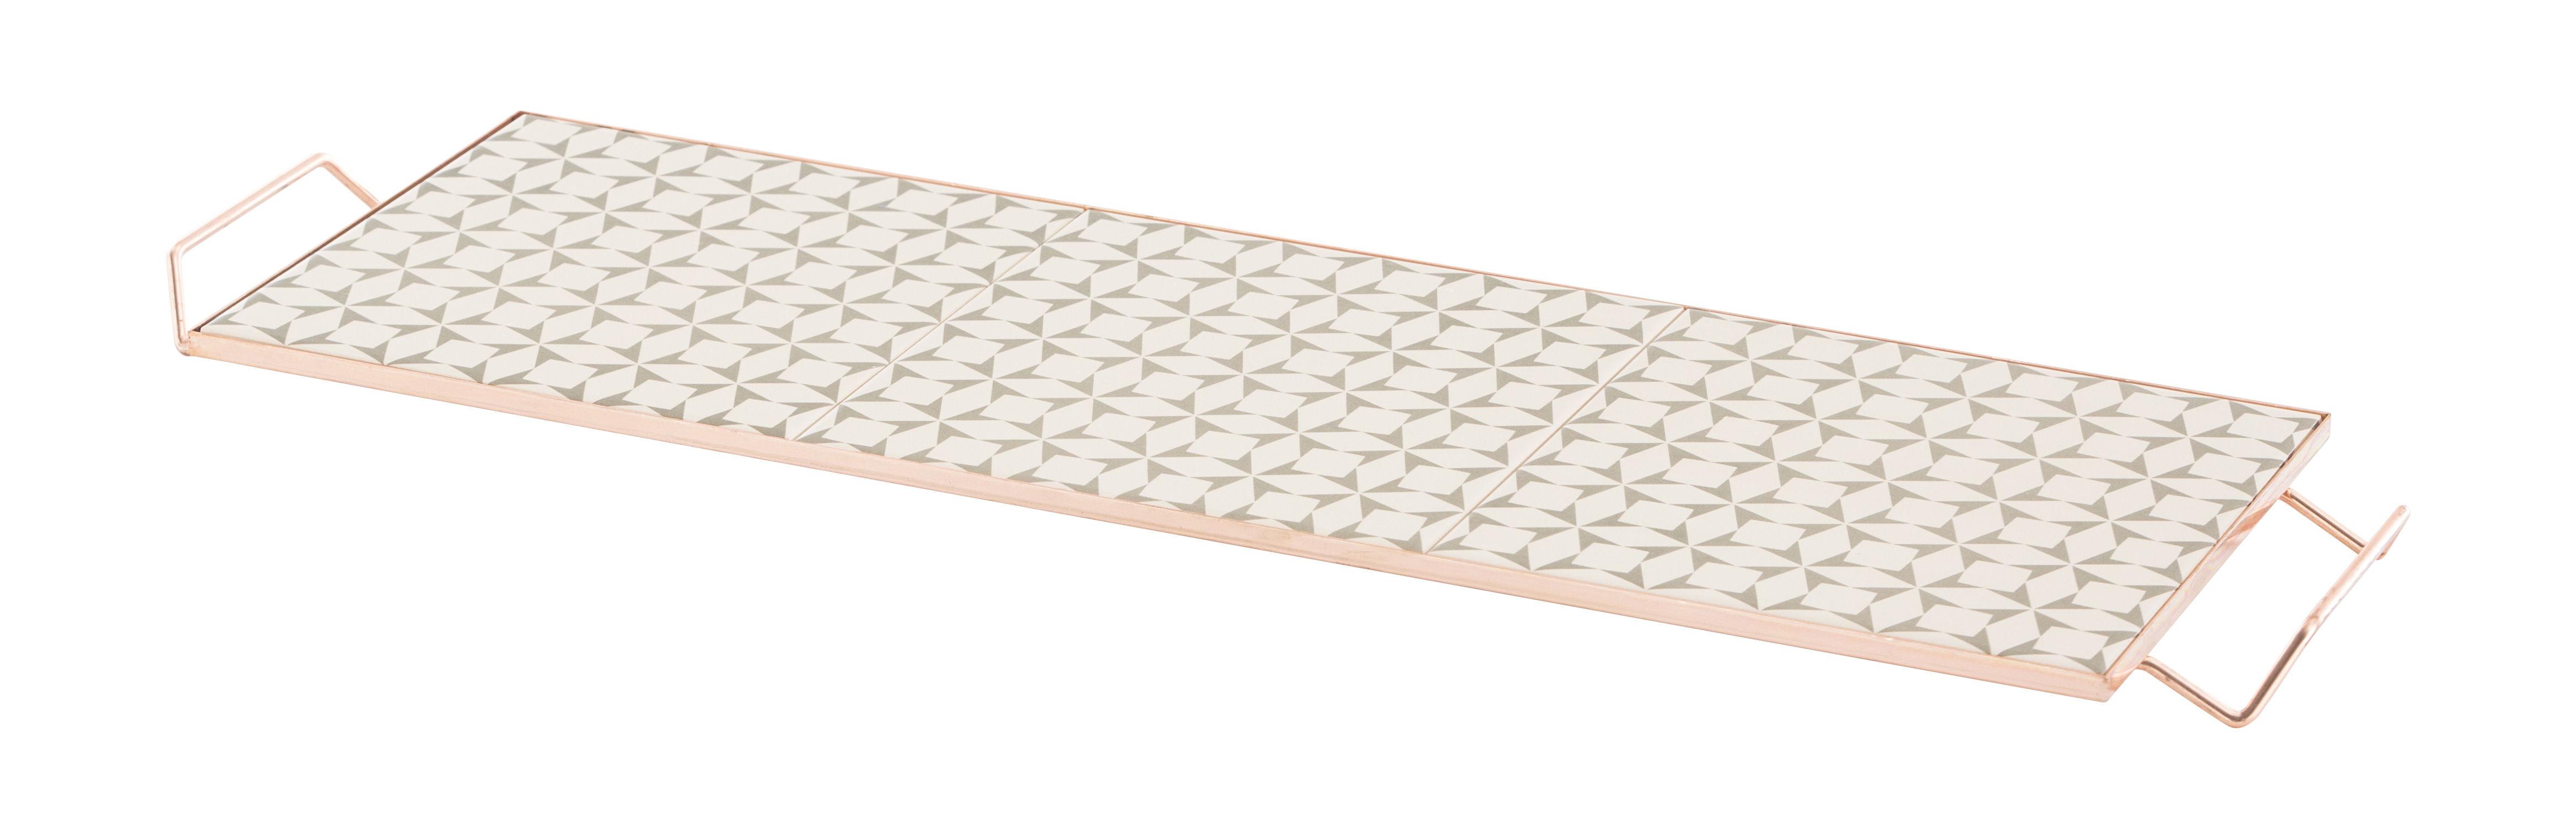 Tableware - Trays - Mix&Match Tray - 60 x 20 cm / Ceramic & copper by Gan - Grey & white - Ceramic, Copper plated aluminium